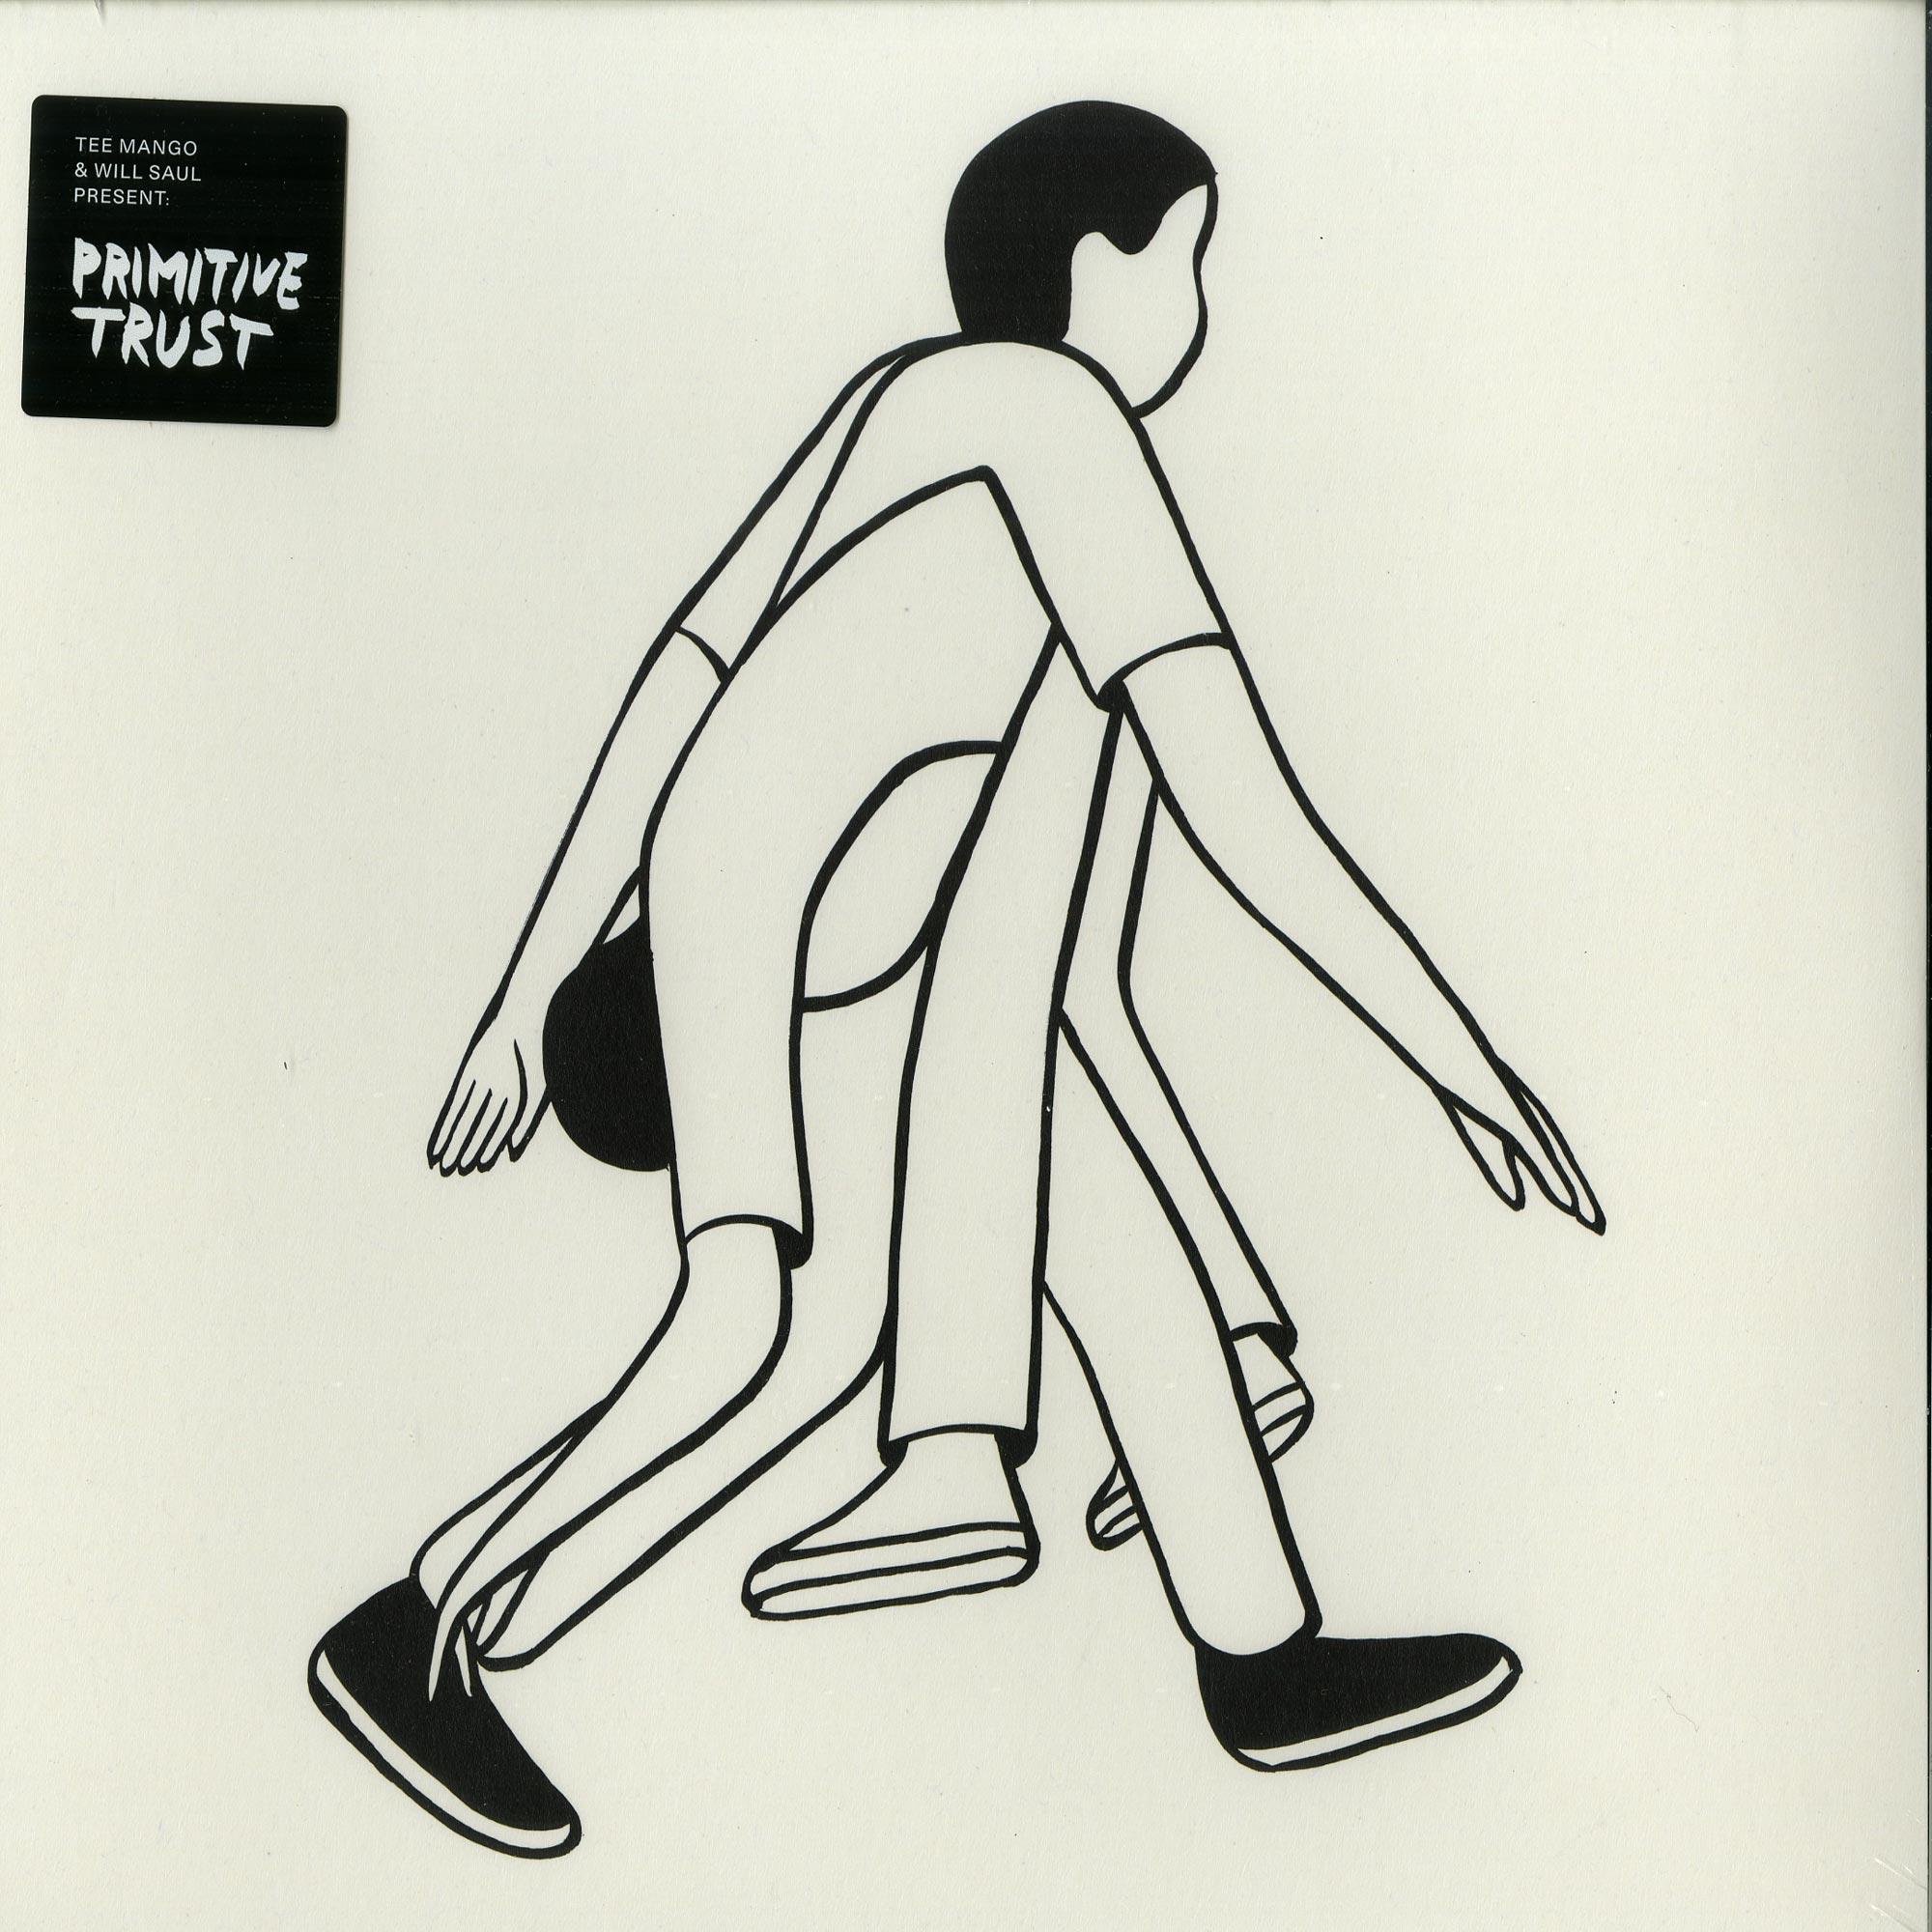 Primitive Trust - LITTLE LOVE EP